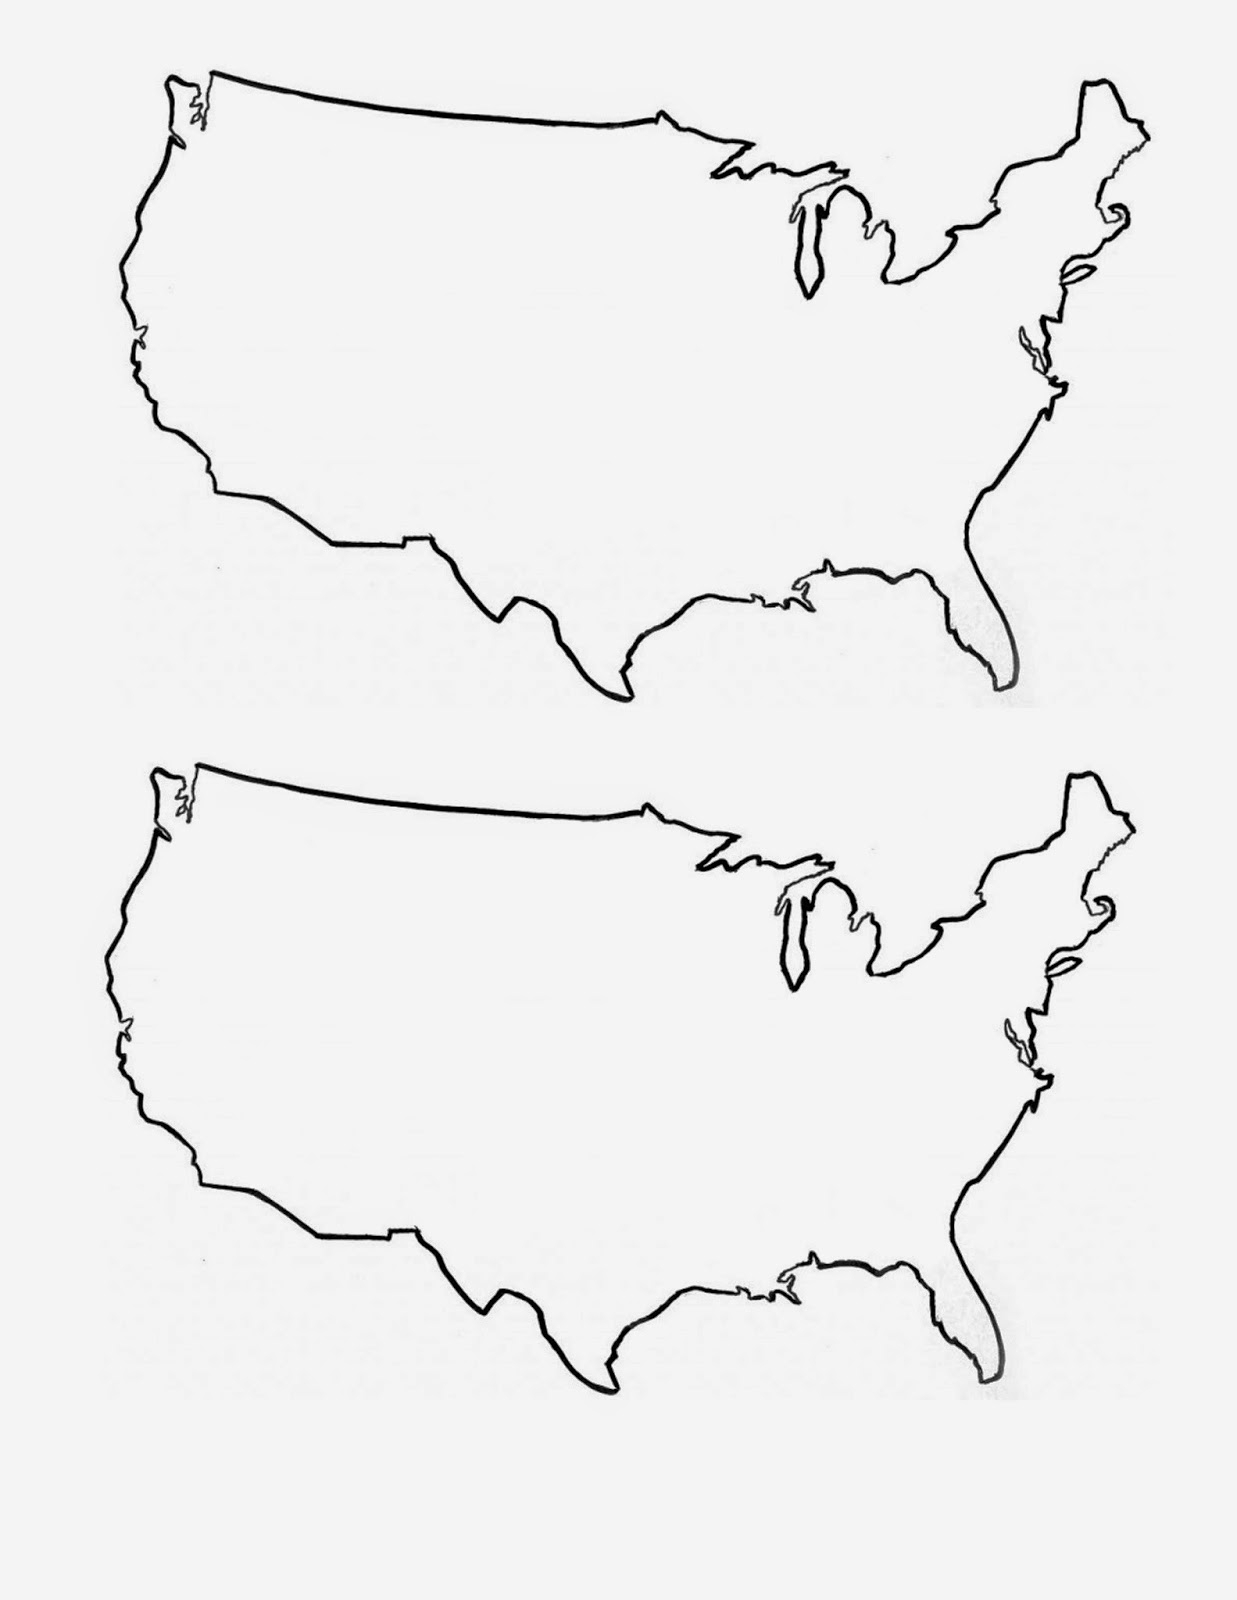 United States Drawing : united, states, drawing, Drawing, GetDrawings, Download